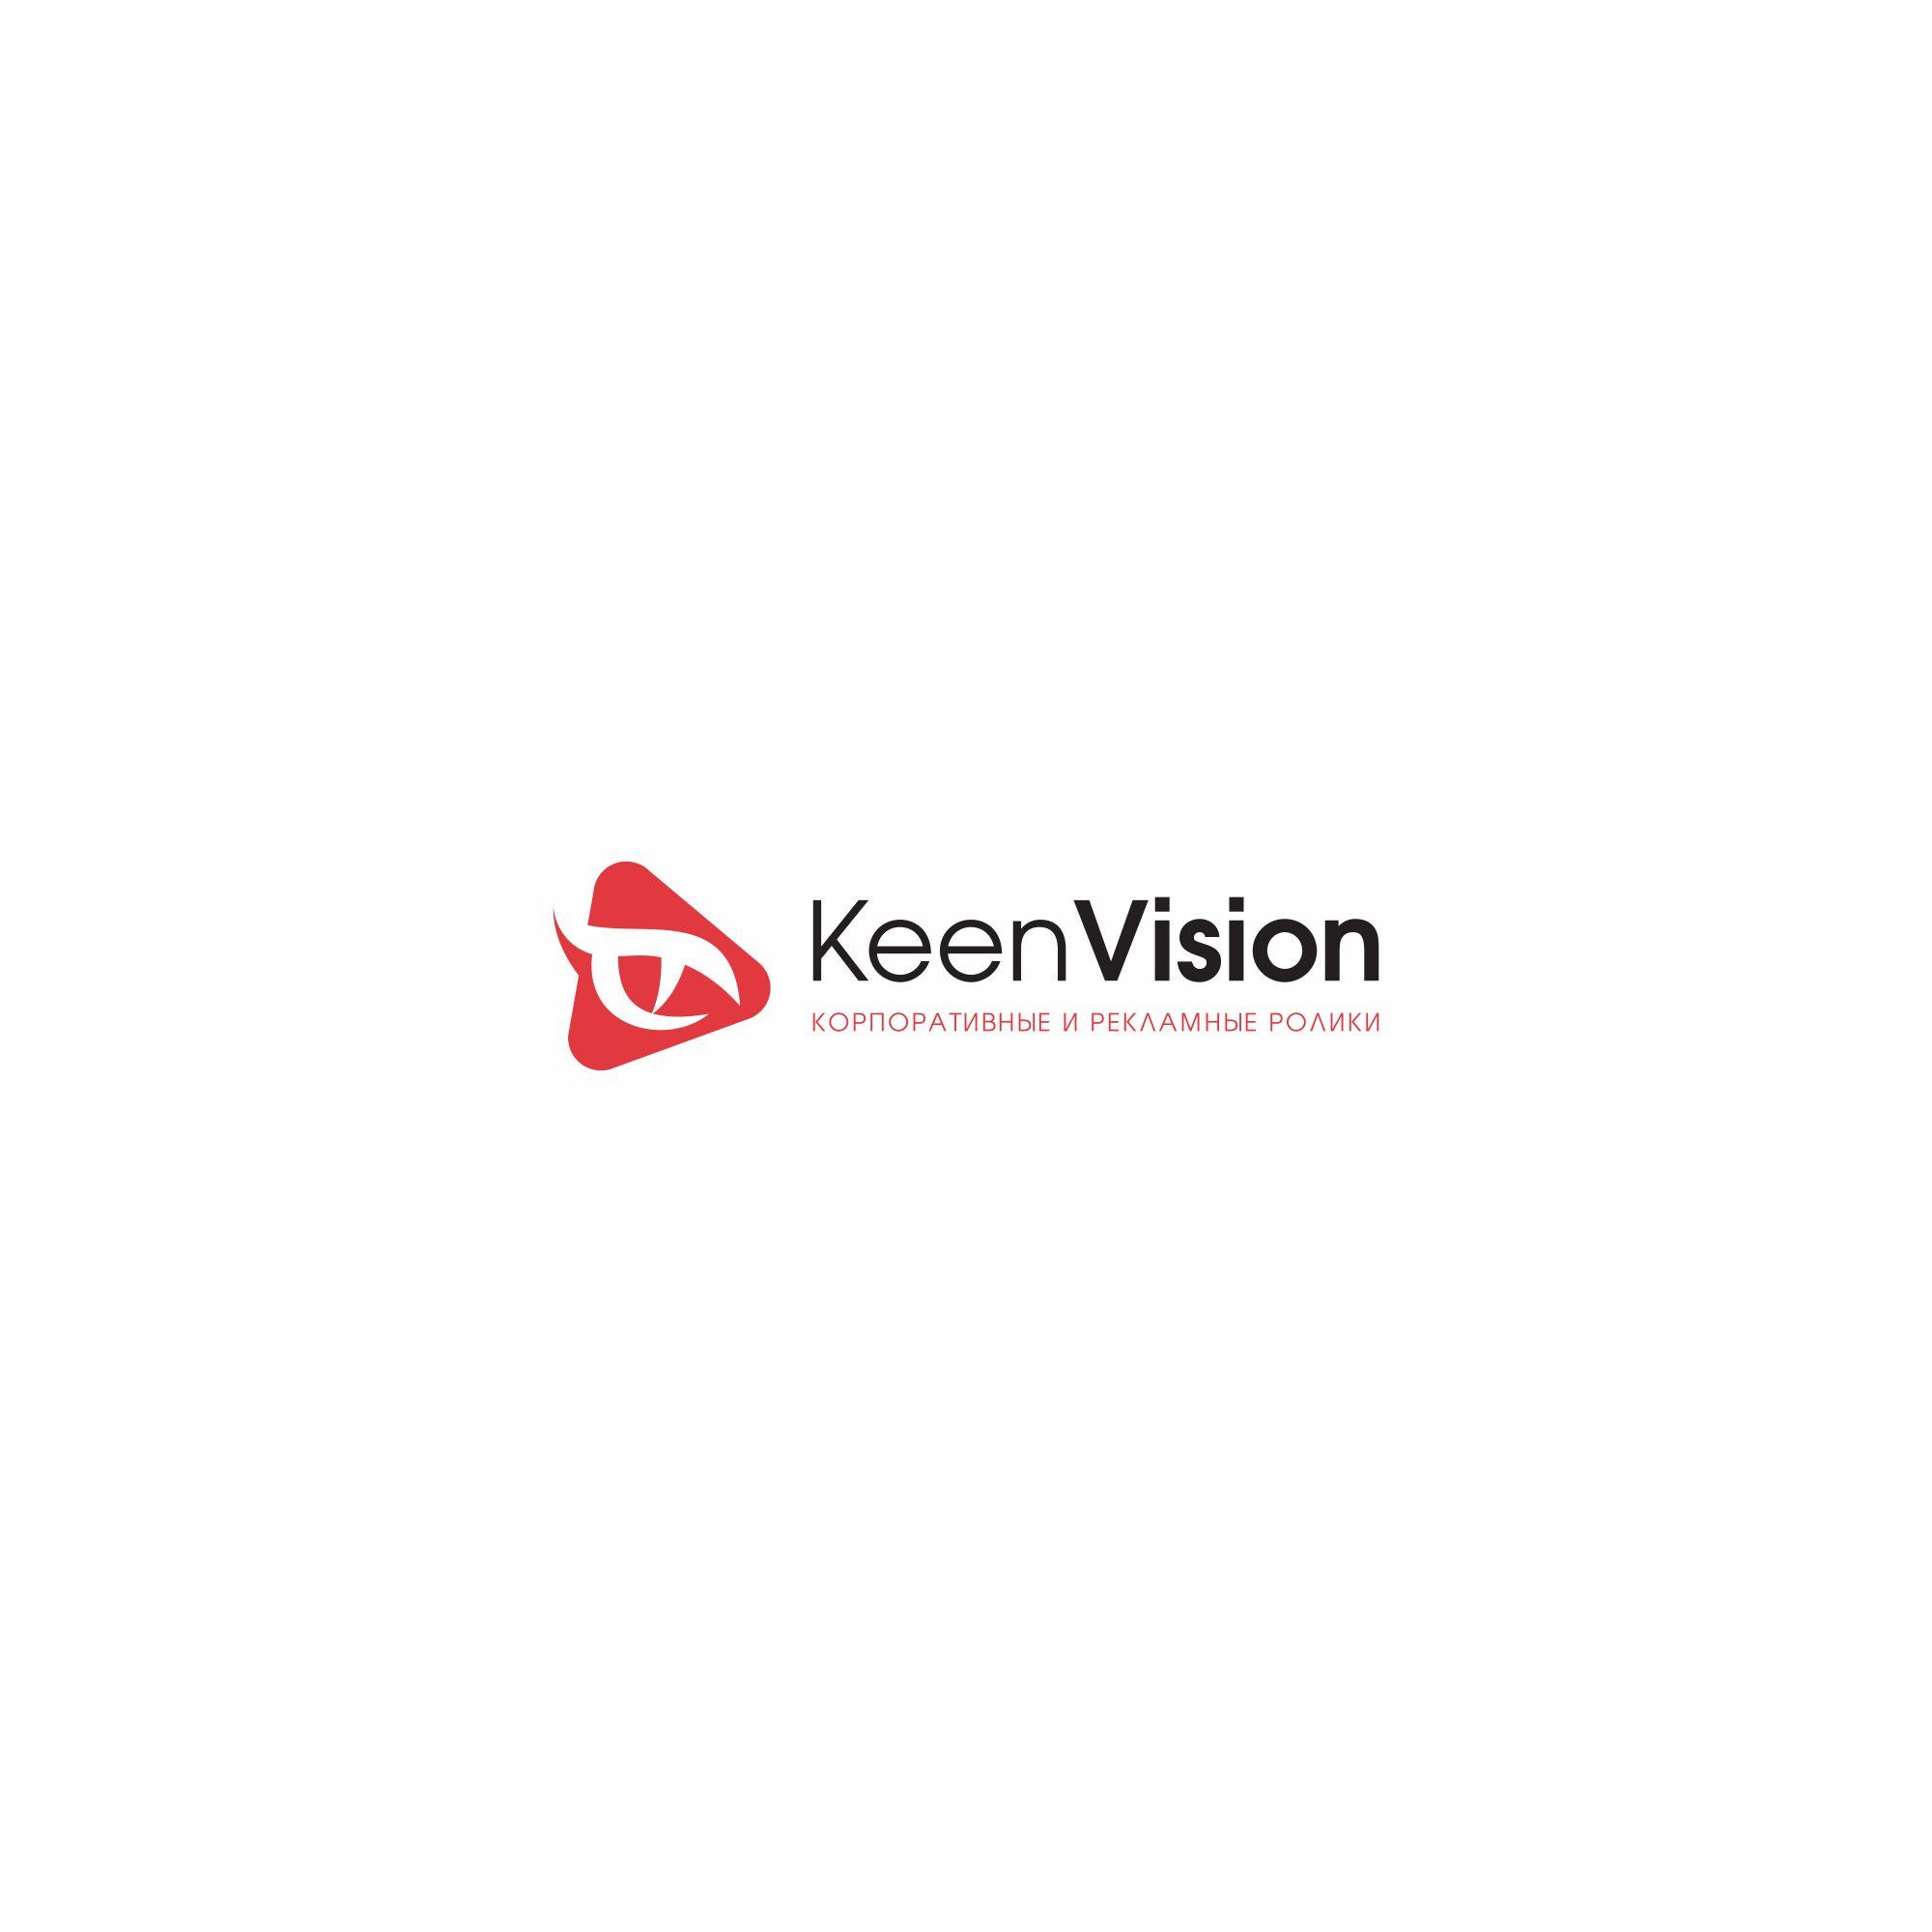 Логотип для KeenVision - дизайнер ironbrands